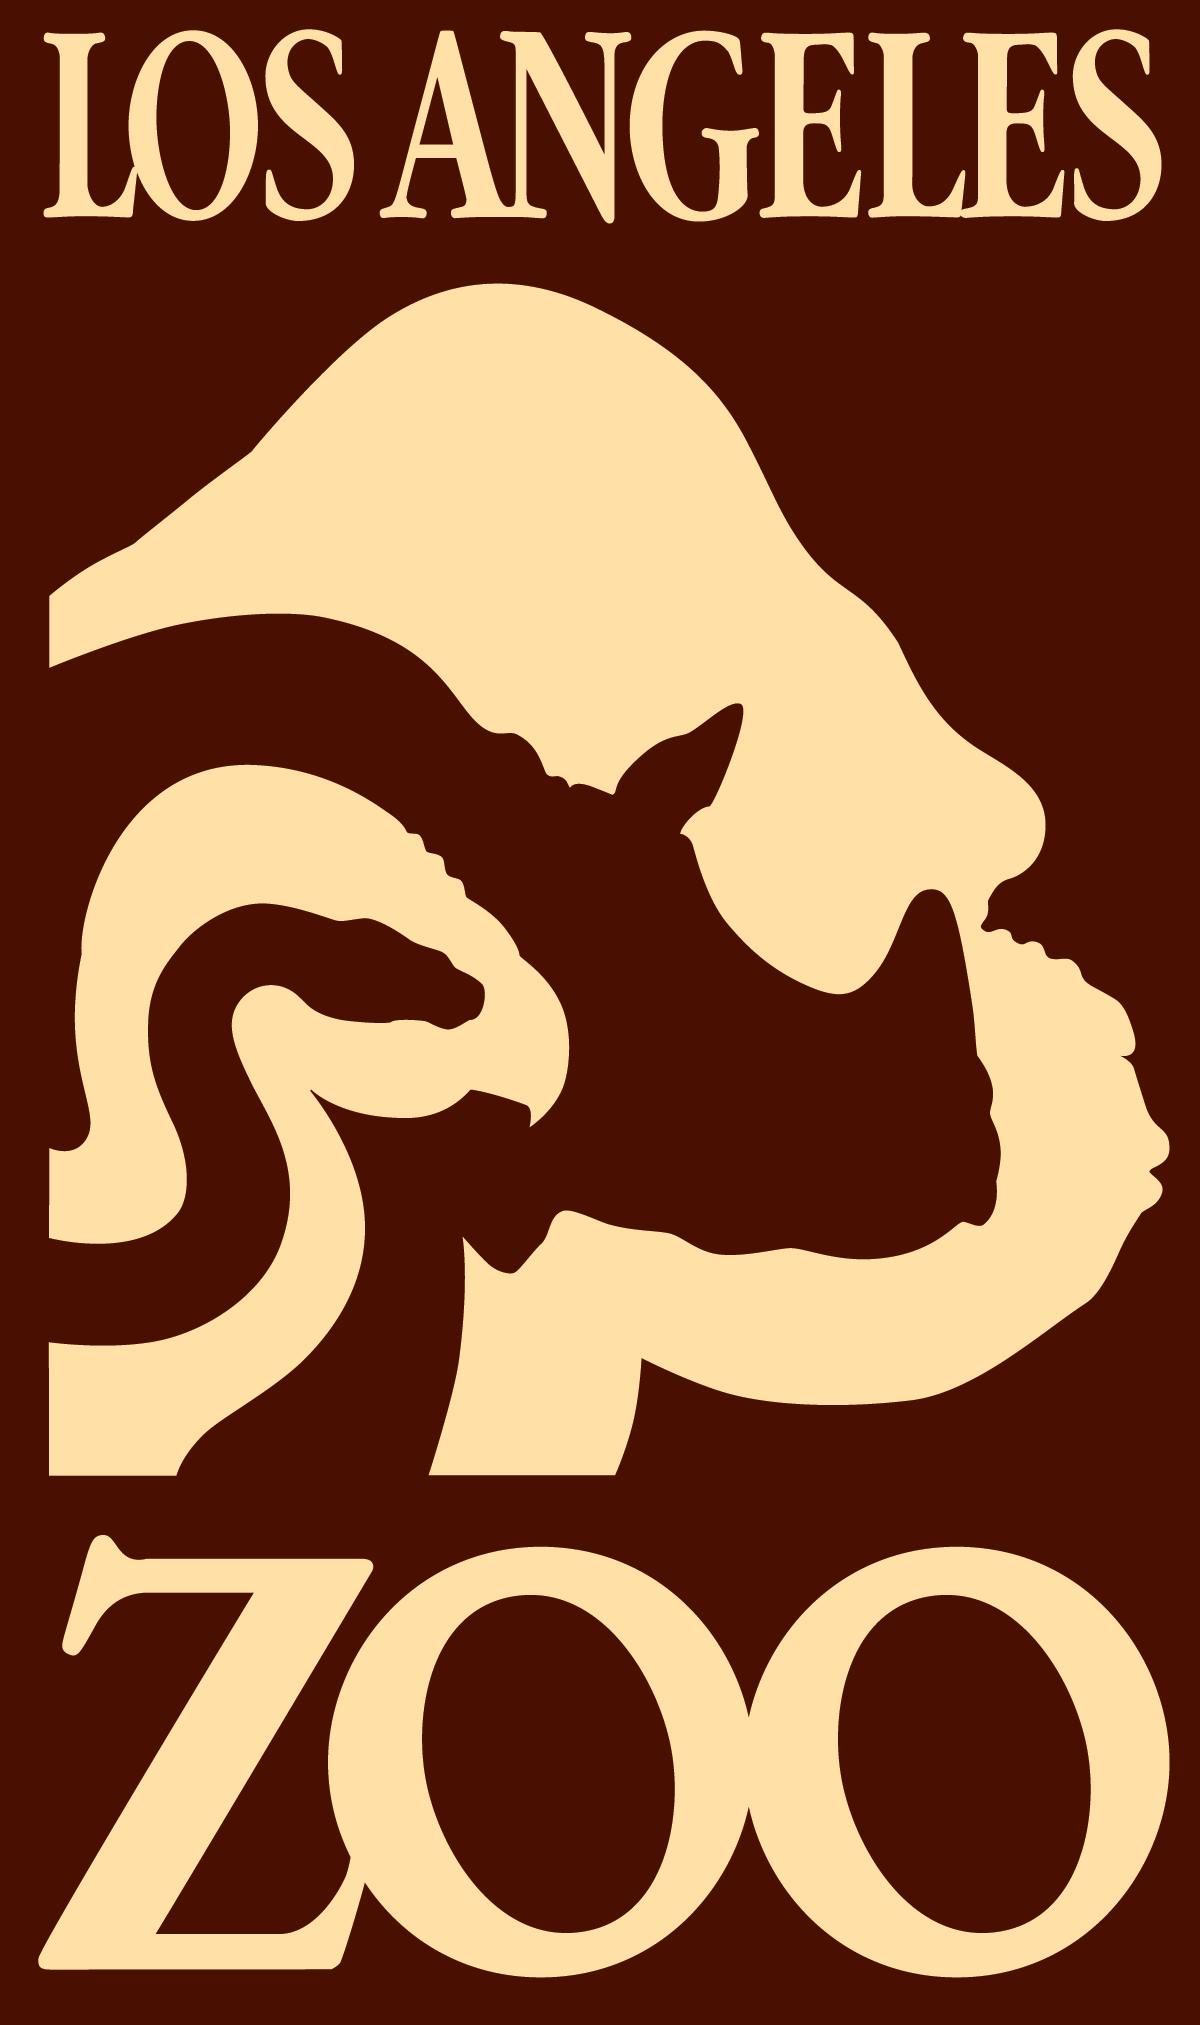 Los Angeles Zoo logo